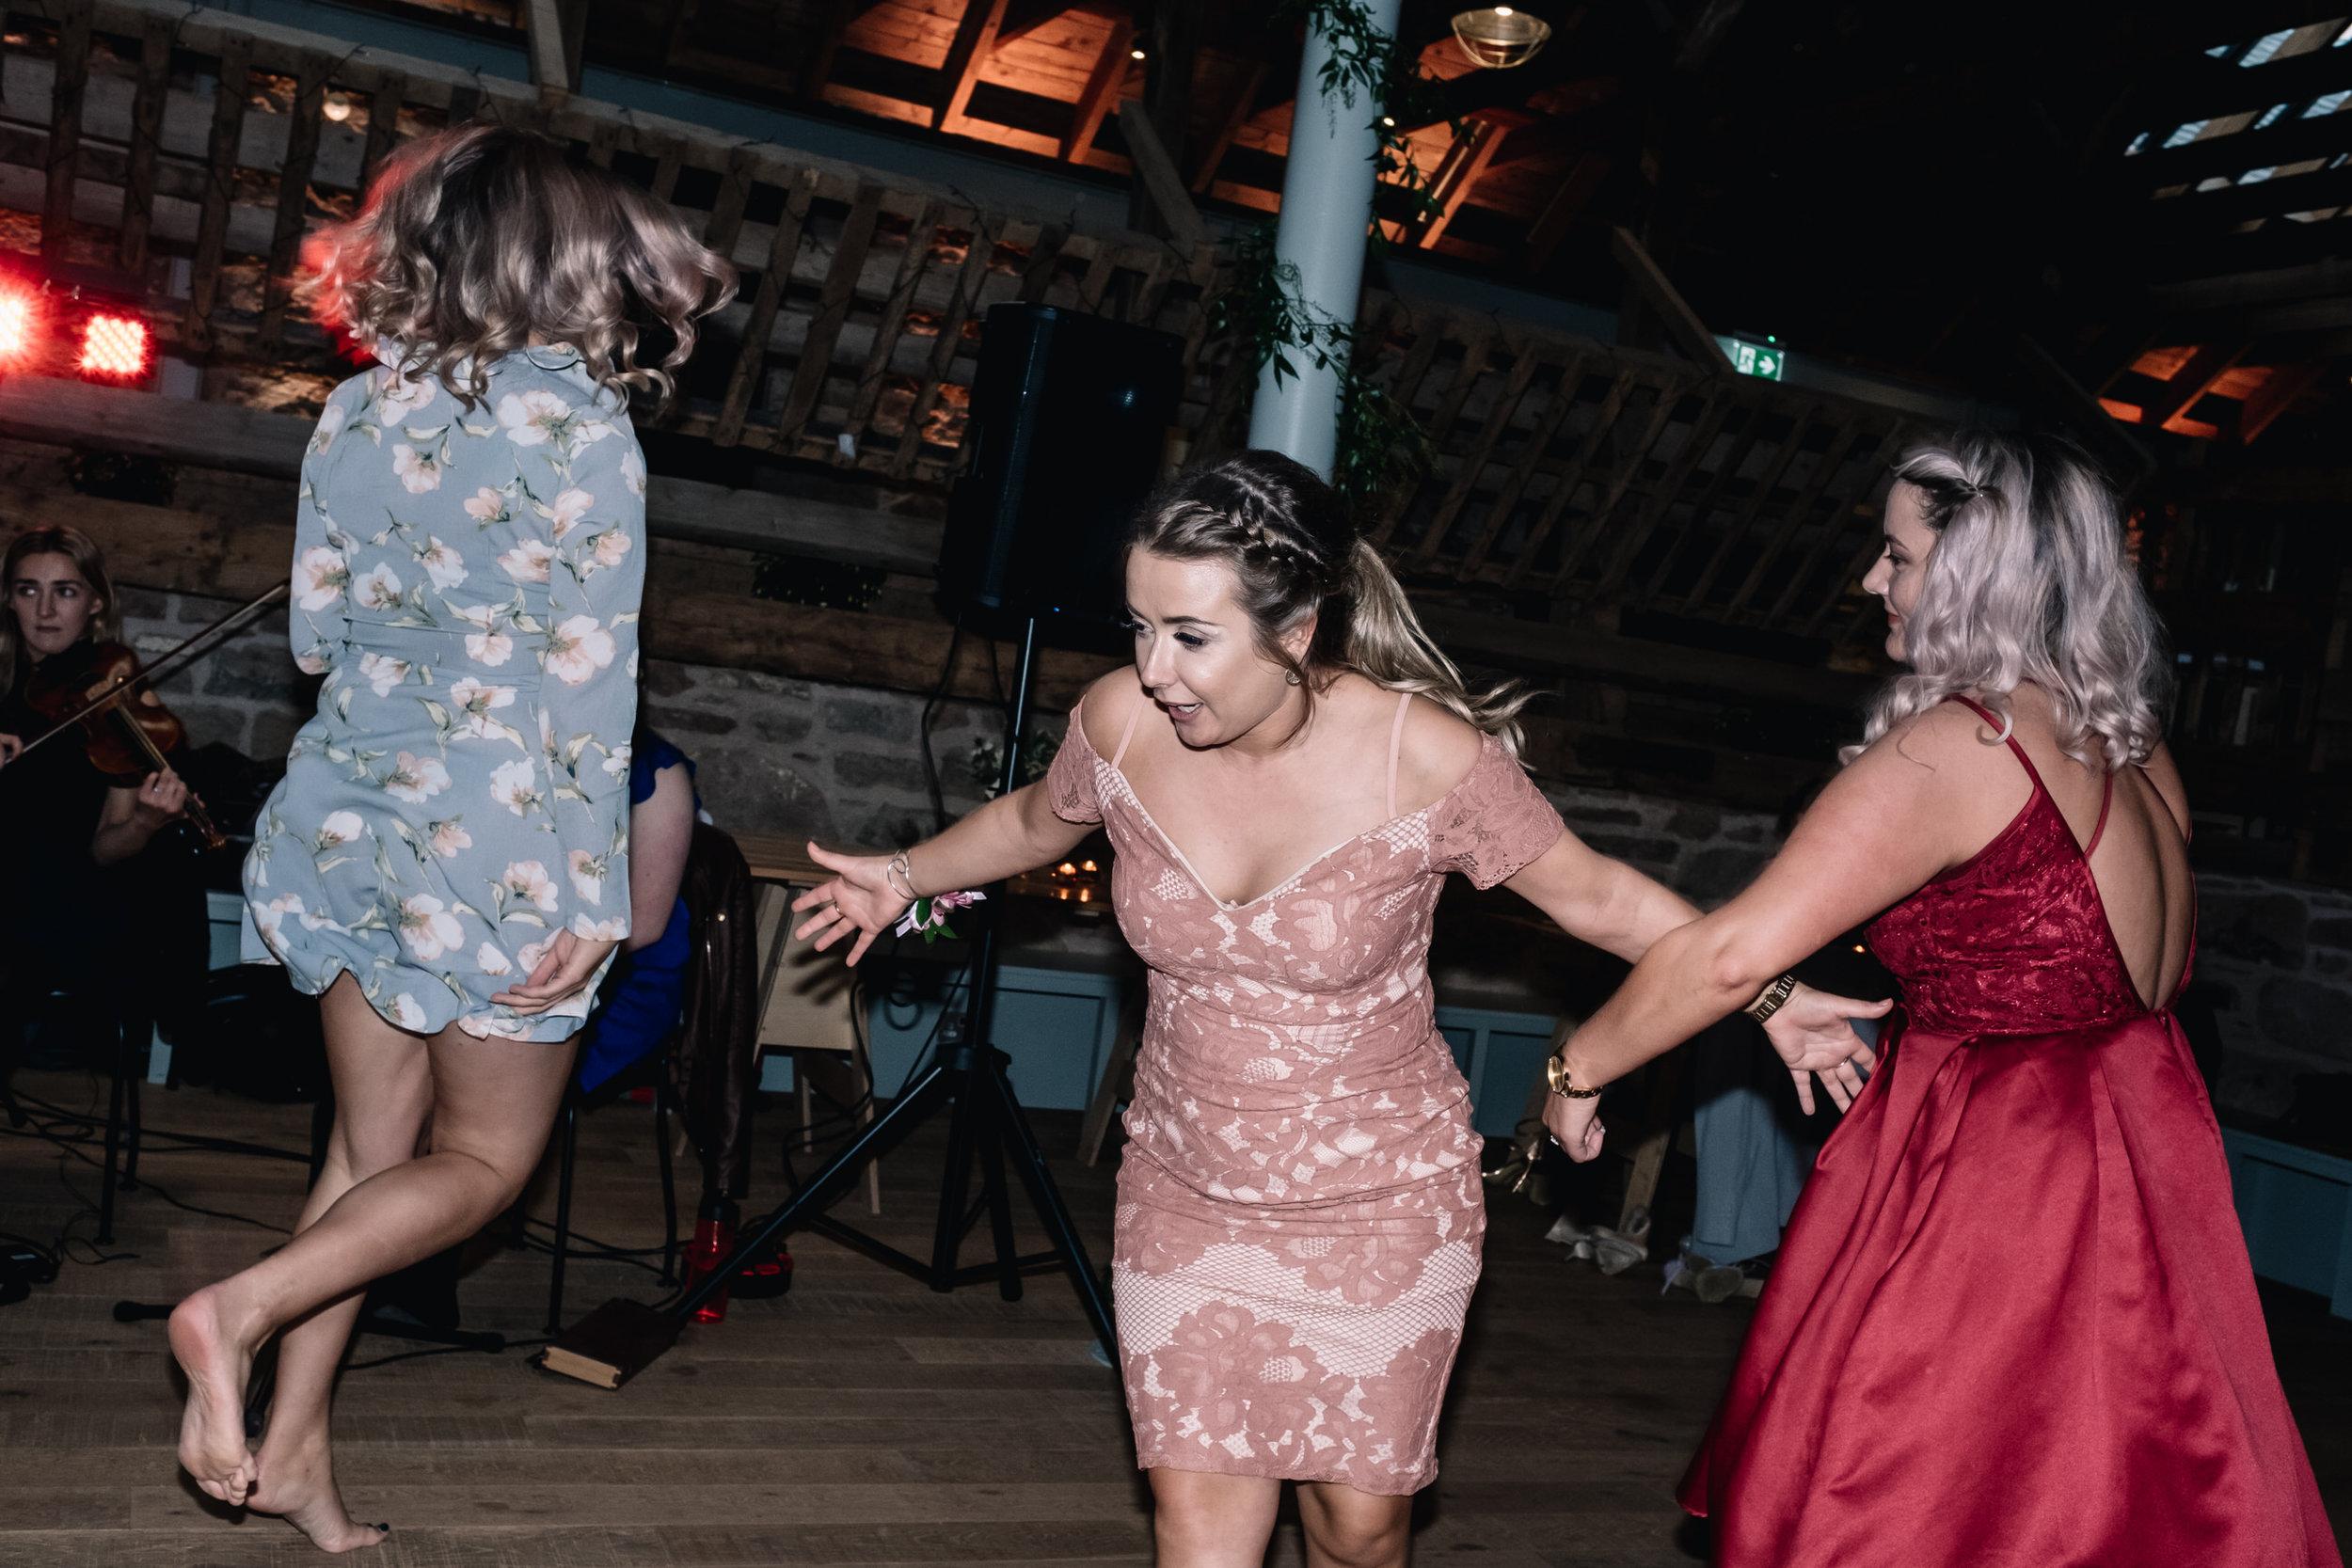 Enthusiastic female dancers